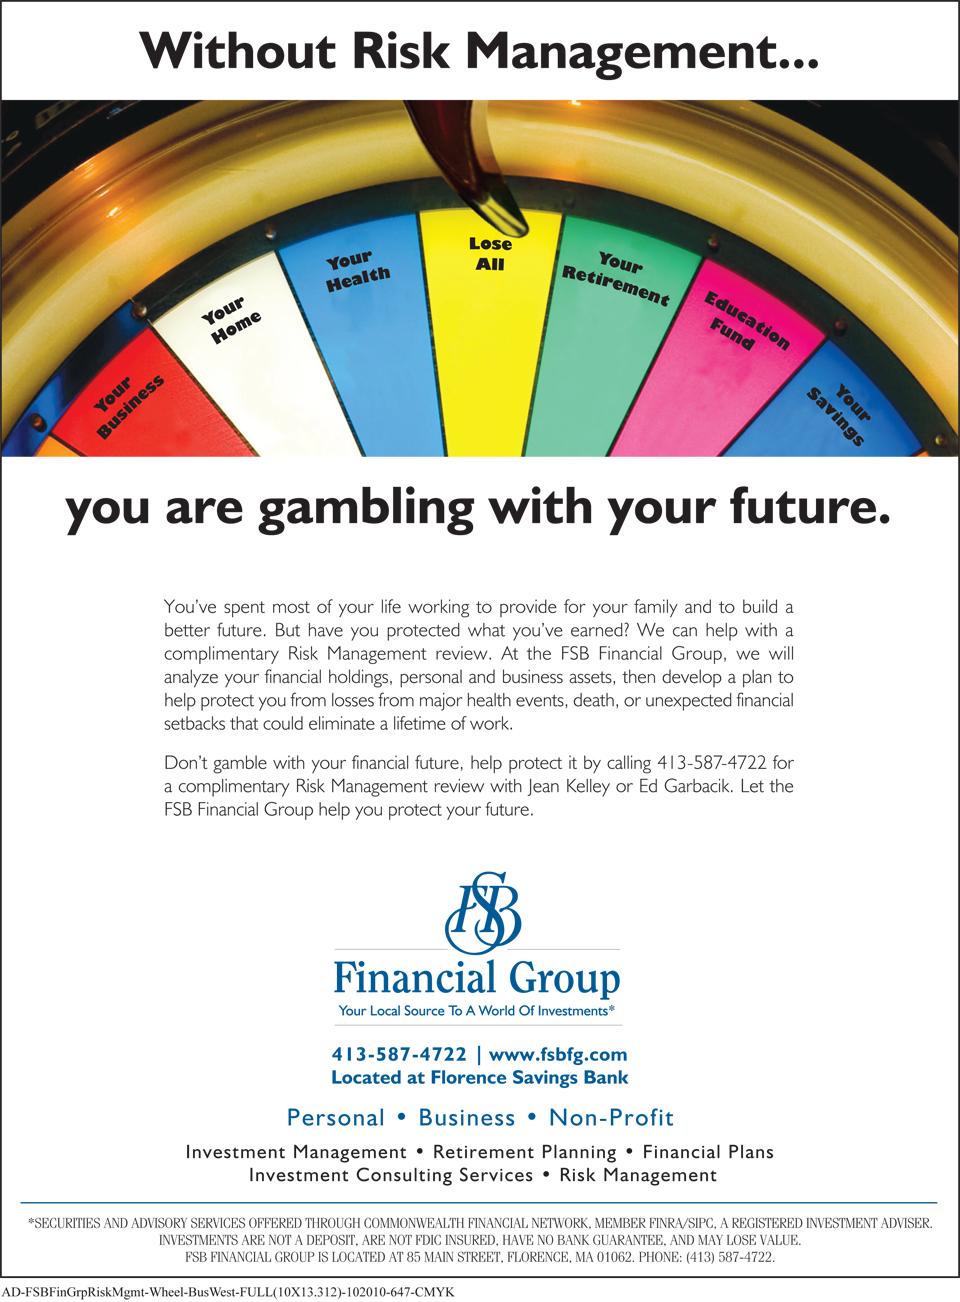 FSBFG-AD_You are gambling...